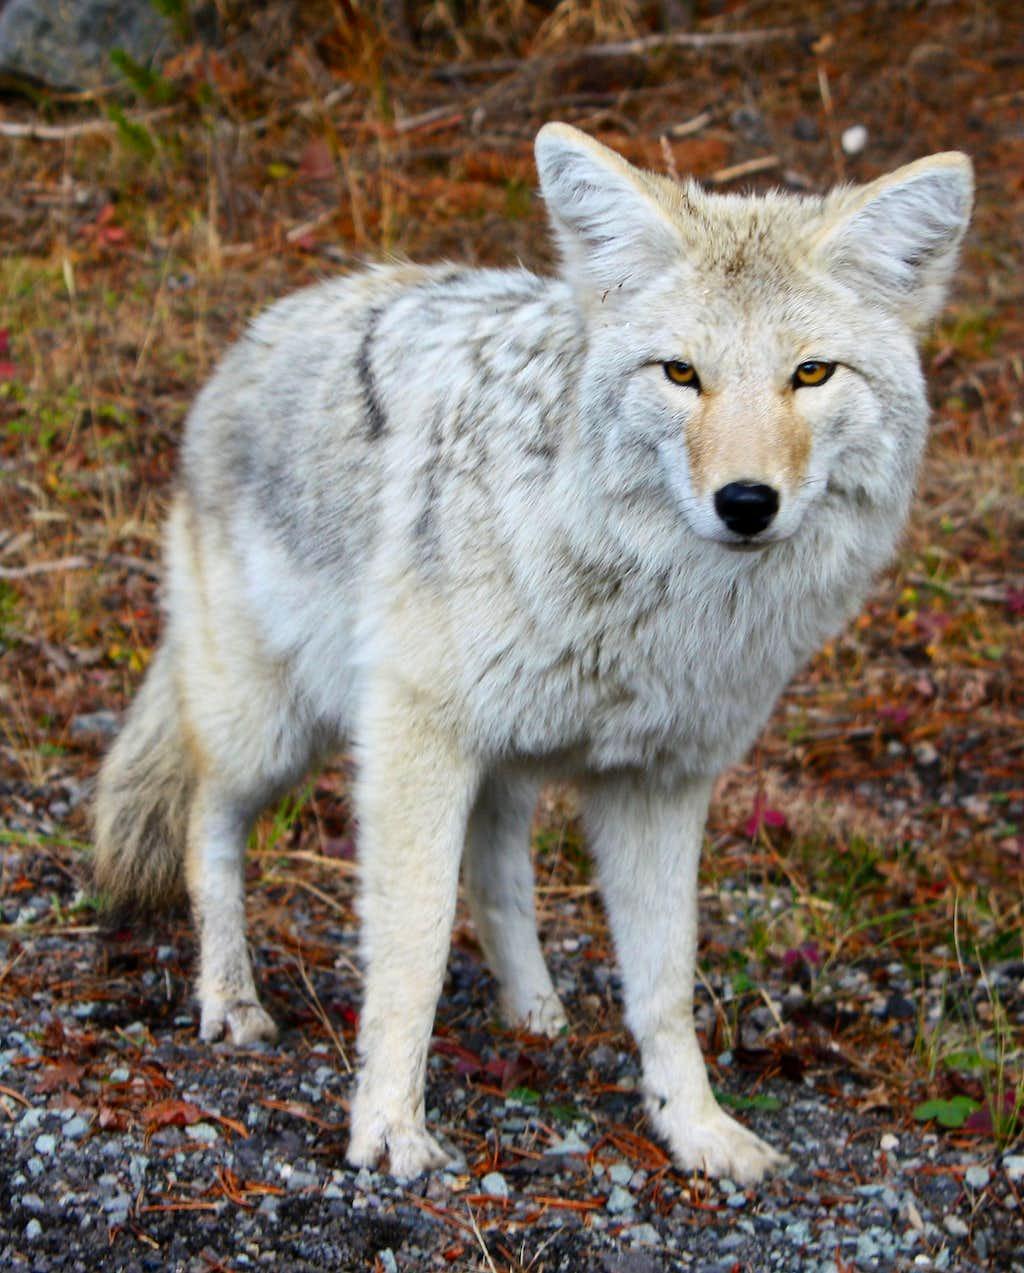 Coyote v. Wolf I